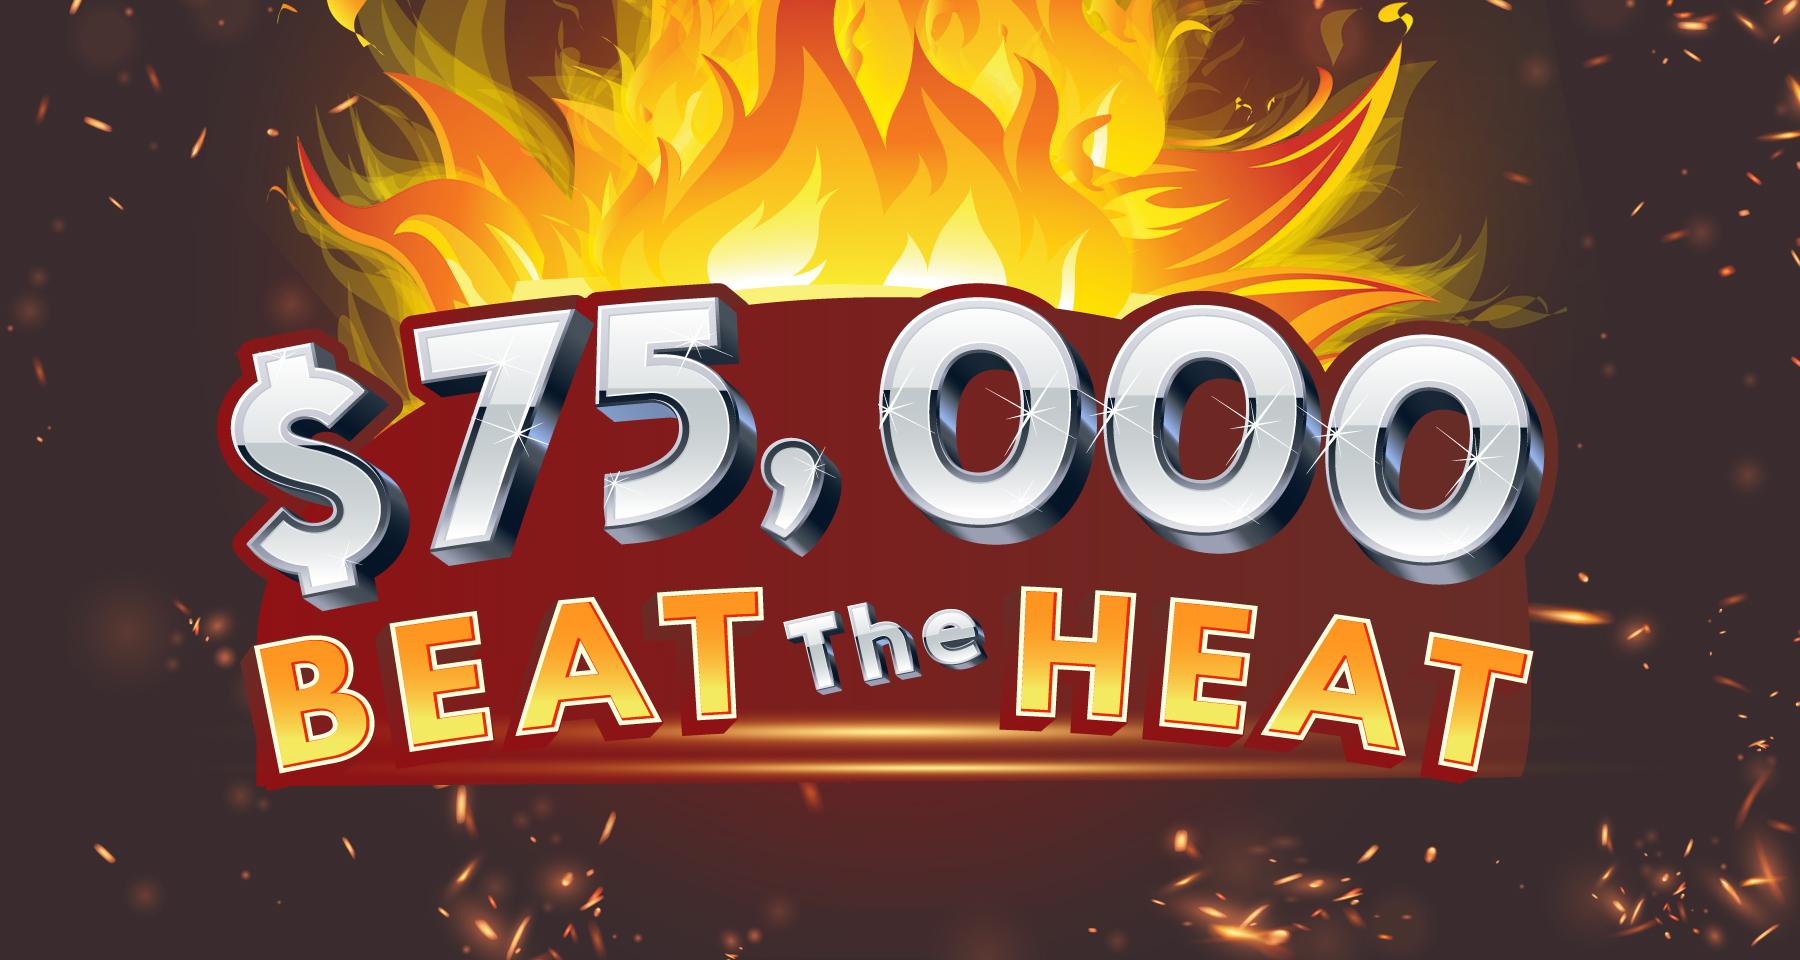 $75,000 Beat The Heat